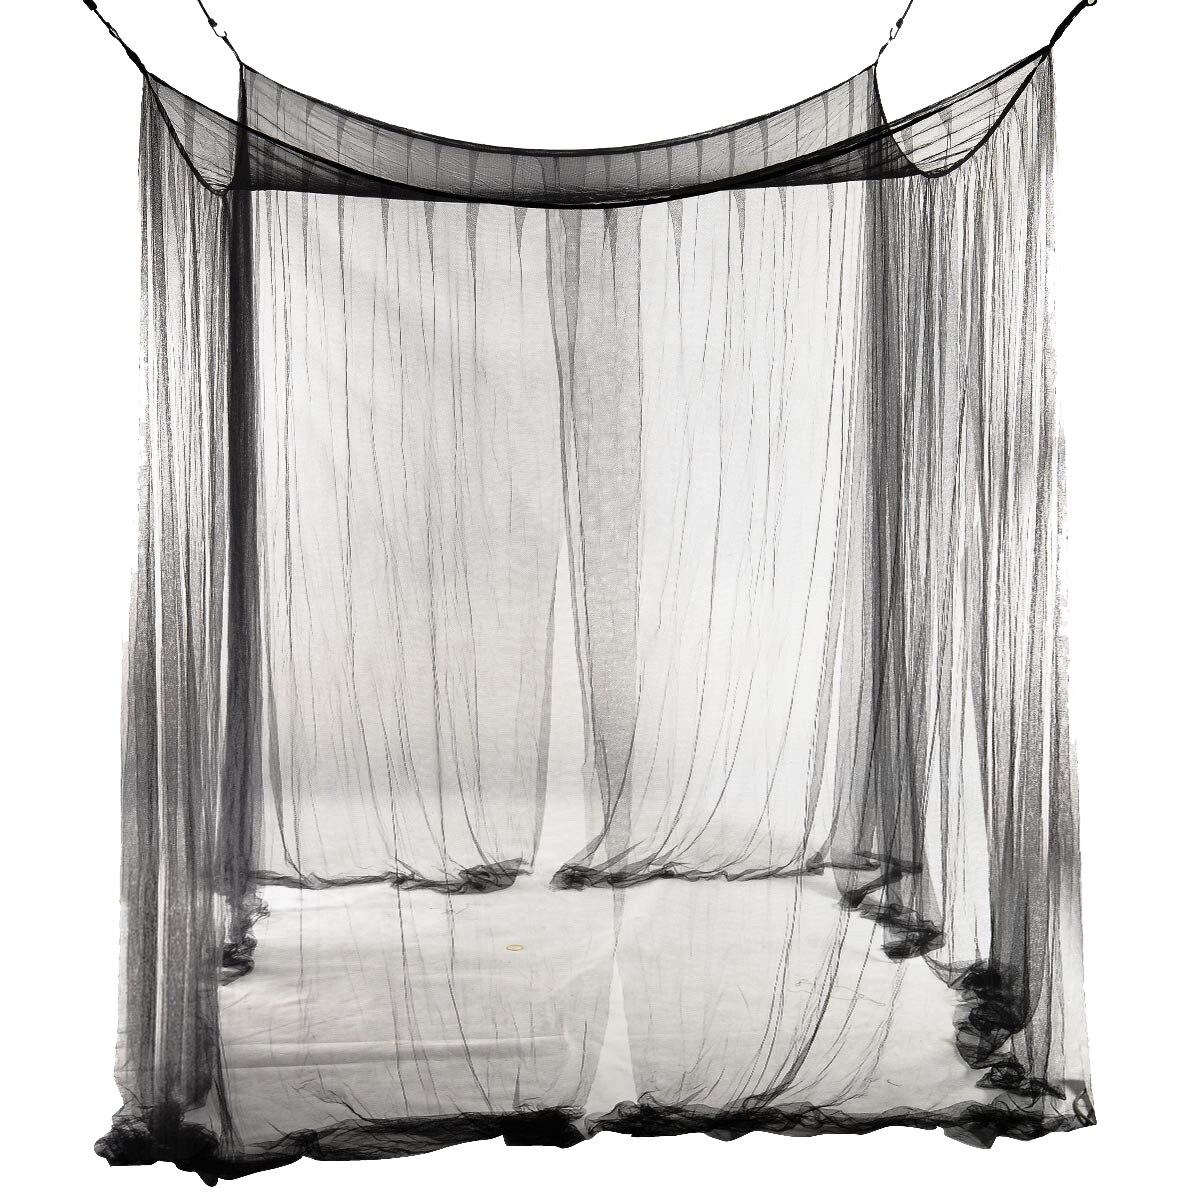 Novo 4-canto cama rede dossel mosquiteiro para cama queen/king size 190*210*240cm (preto)